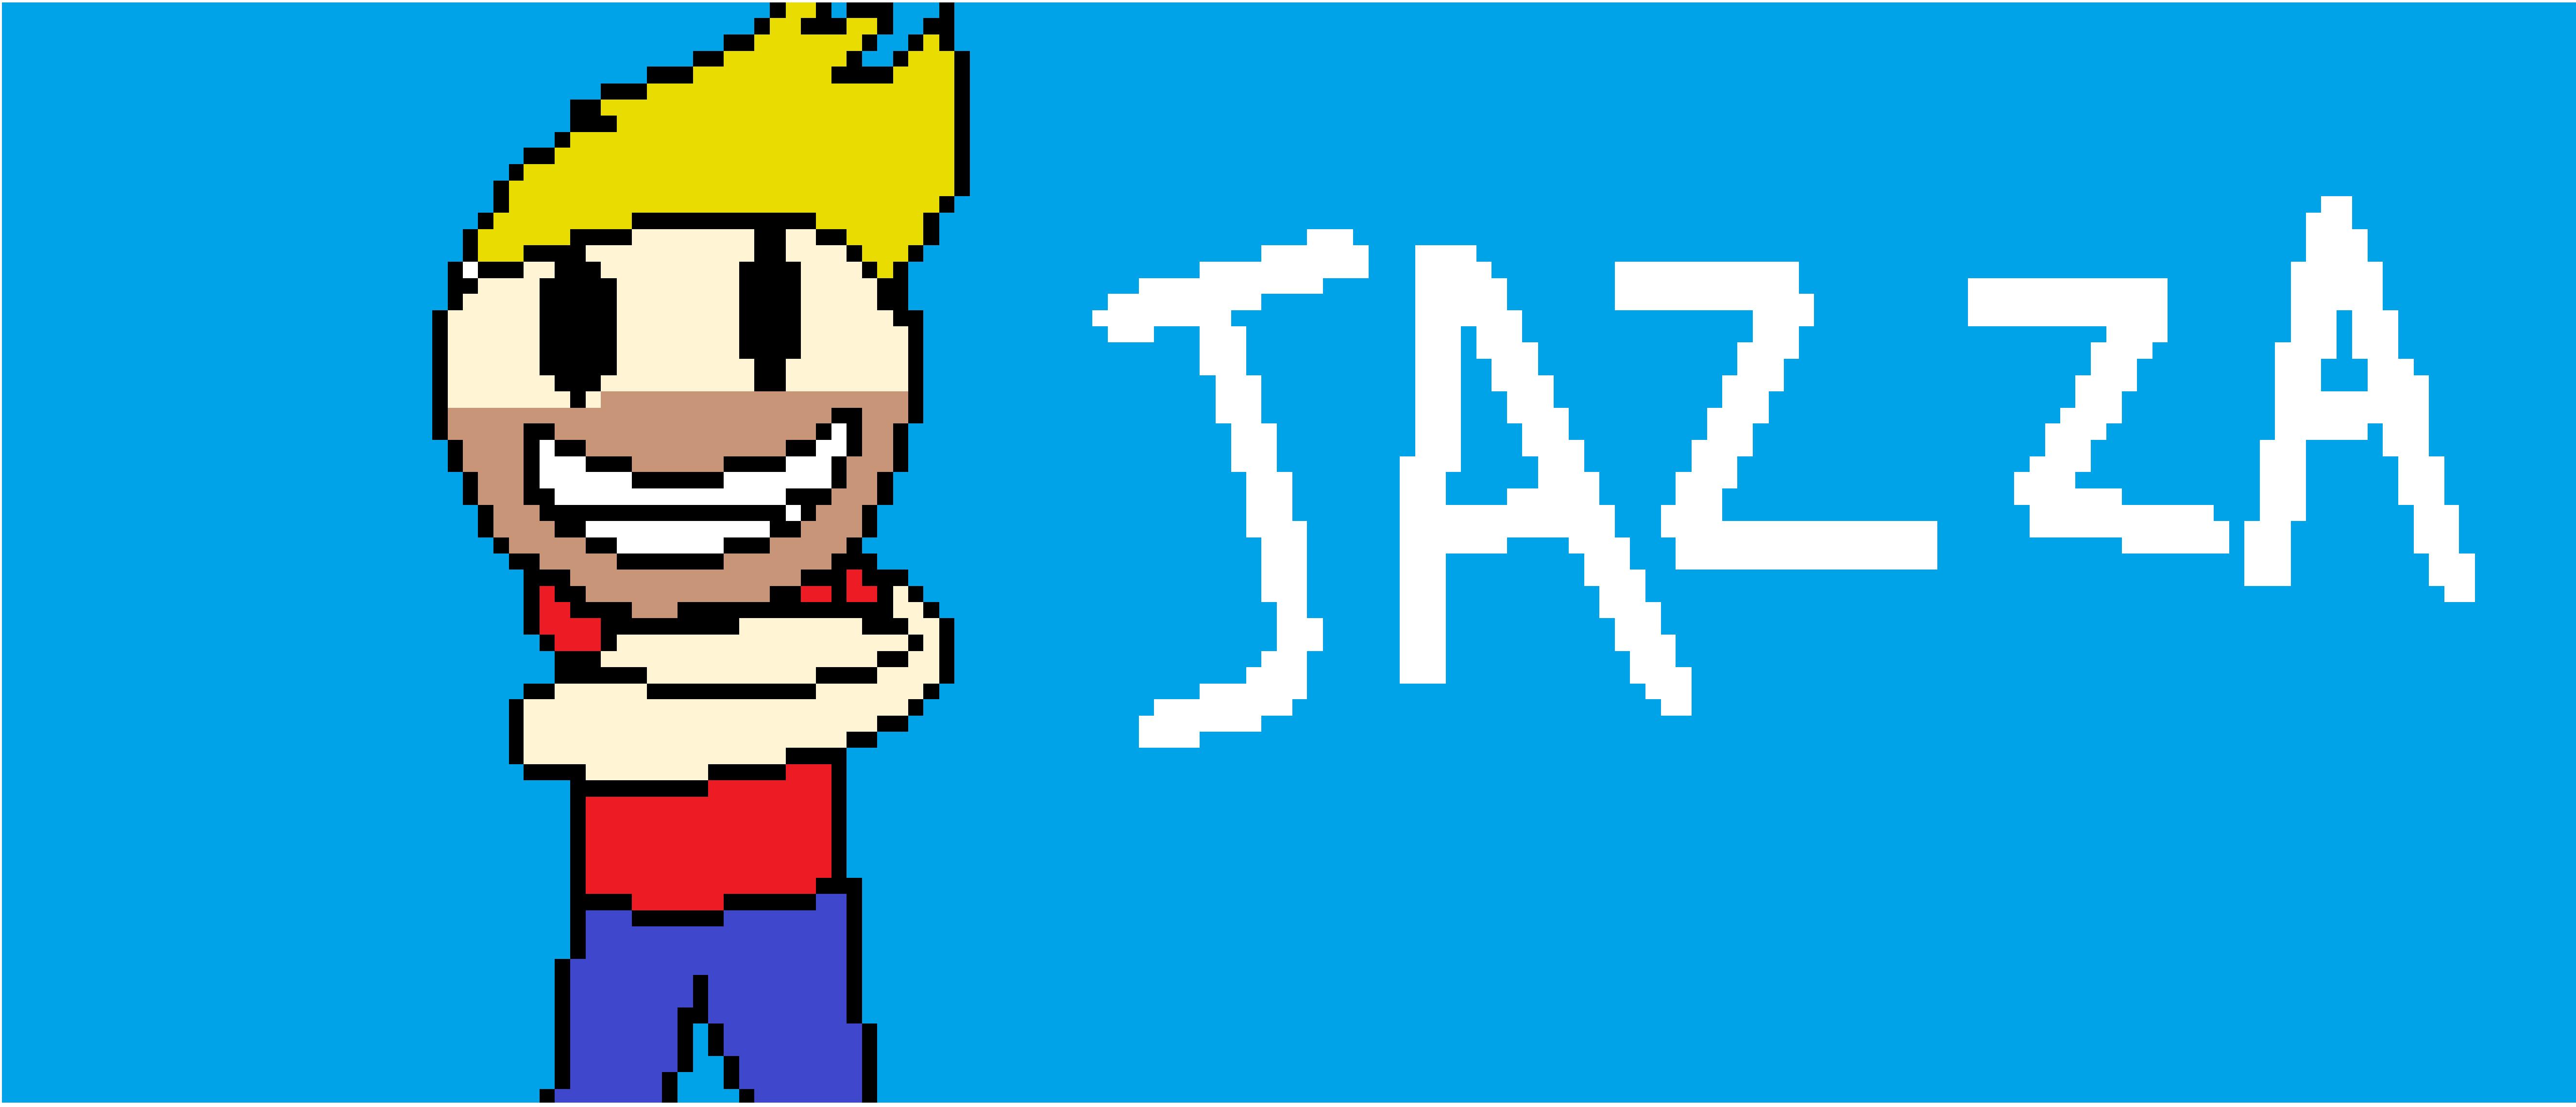 jazza 8 bit